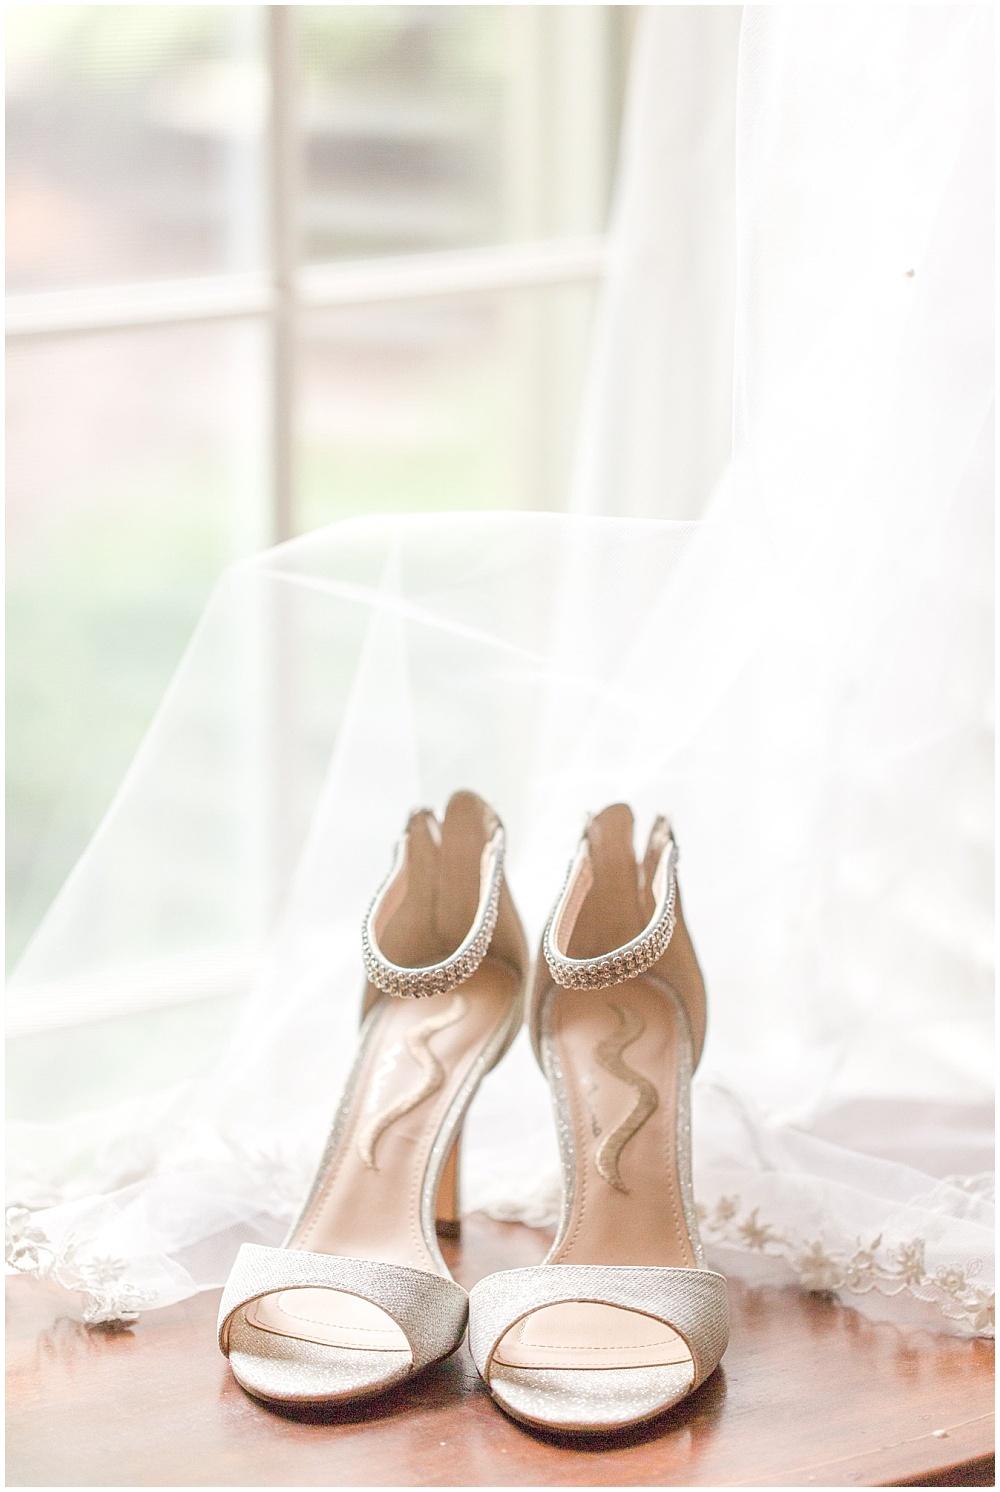 Bridal shoes and veil   Sami Renee Photography + Jessica Dum Wedding Coordination